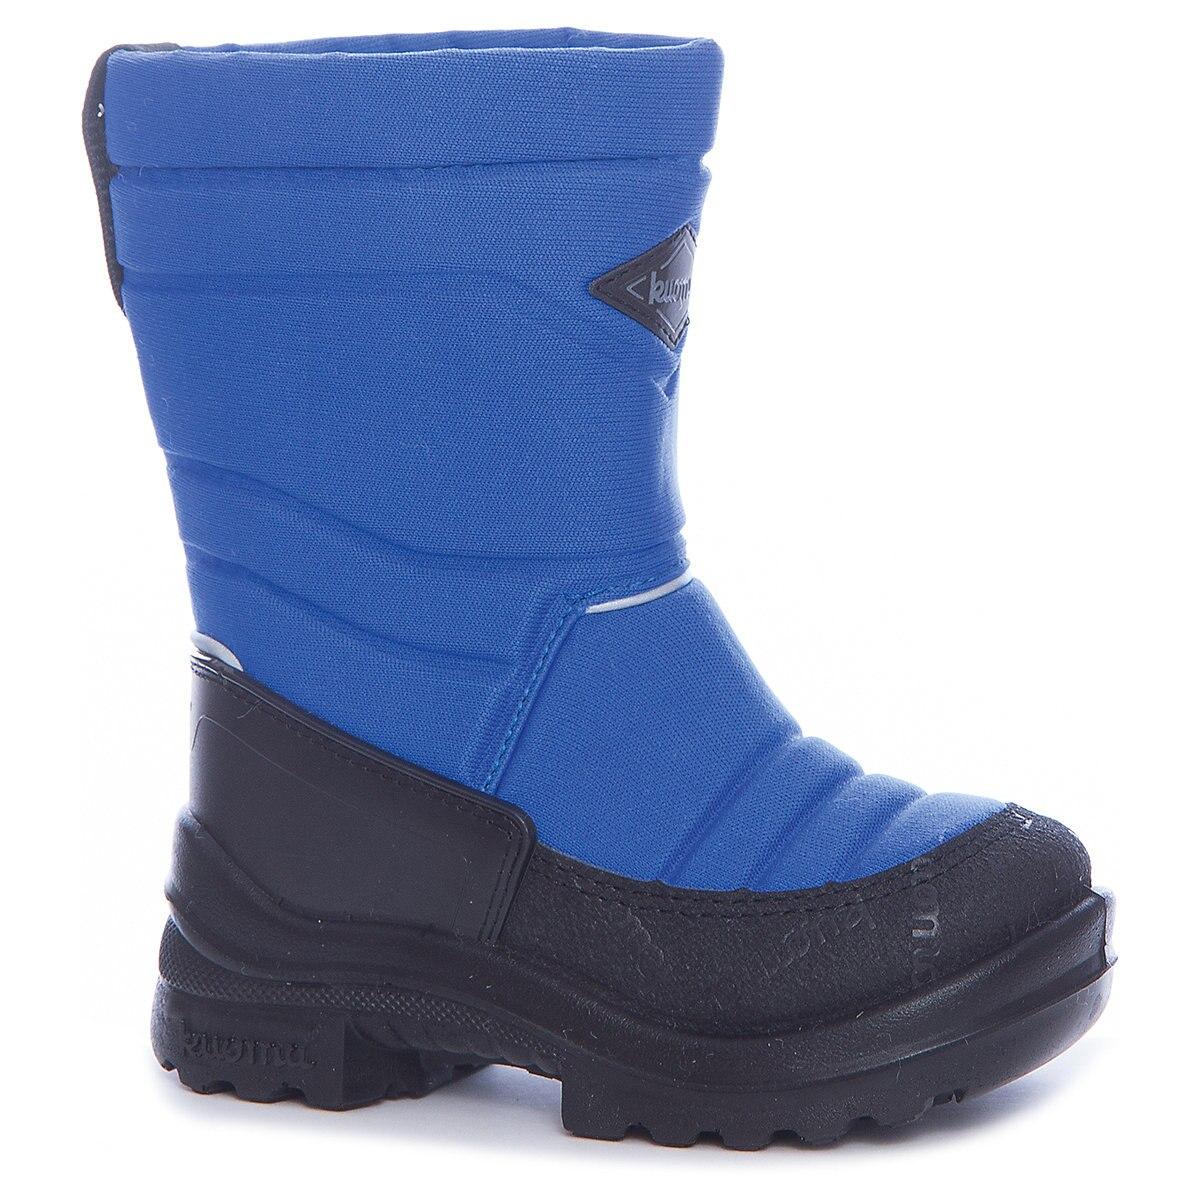 Boots KUOMA for boys 7047006 Valenki Uggi Winter shoes Children Kids MTpromo reima boots 8624989 for boys winter boy children shoes